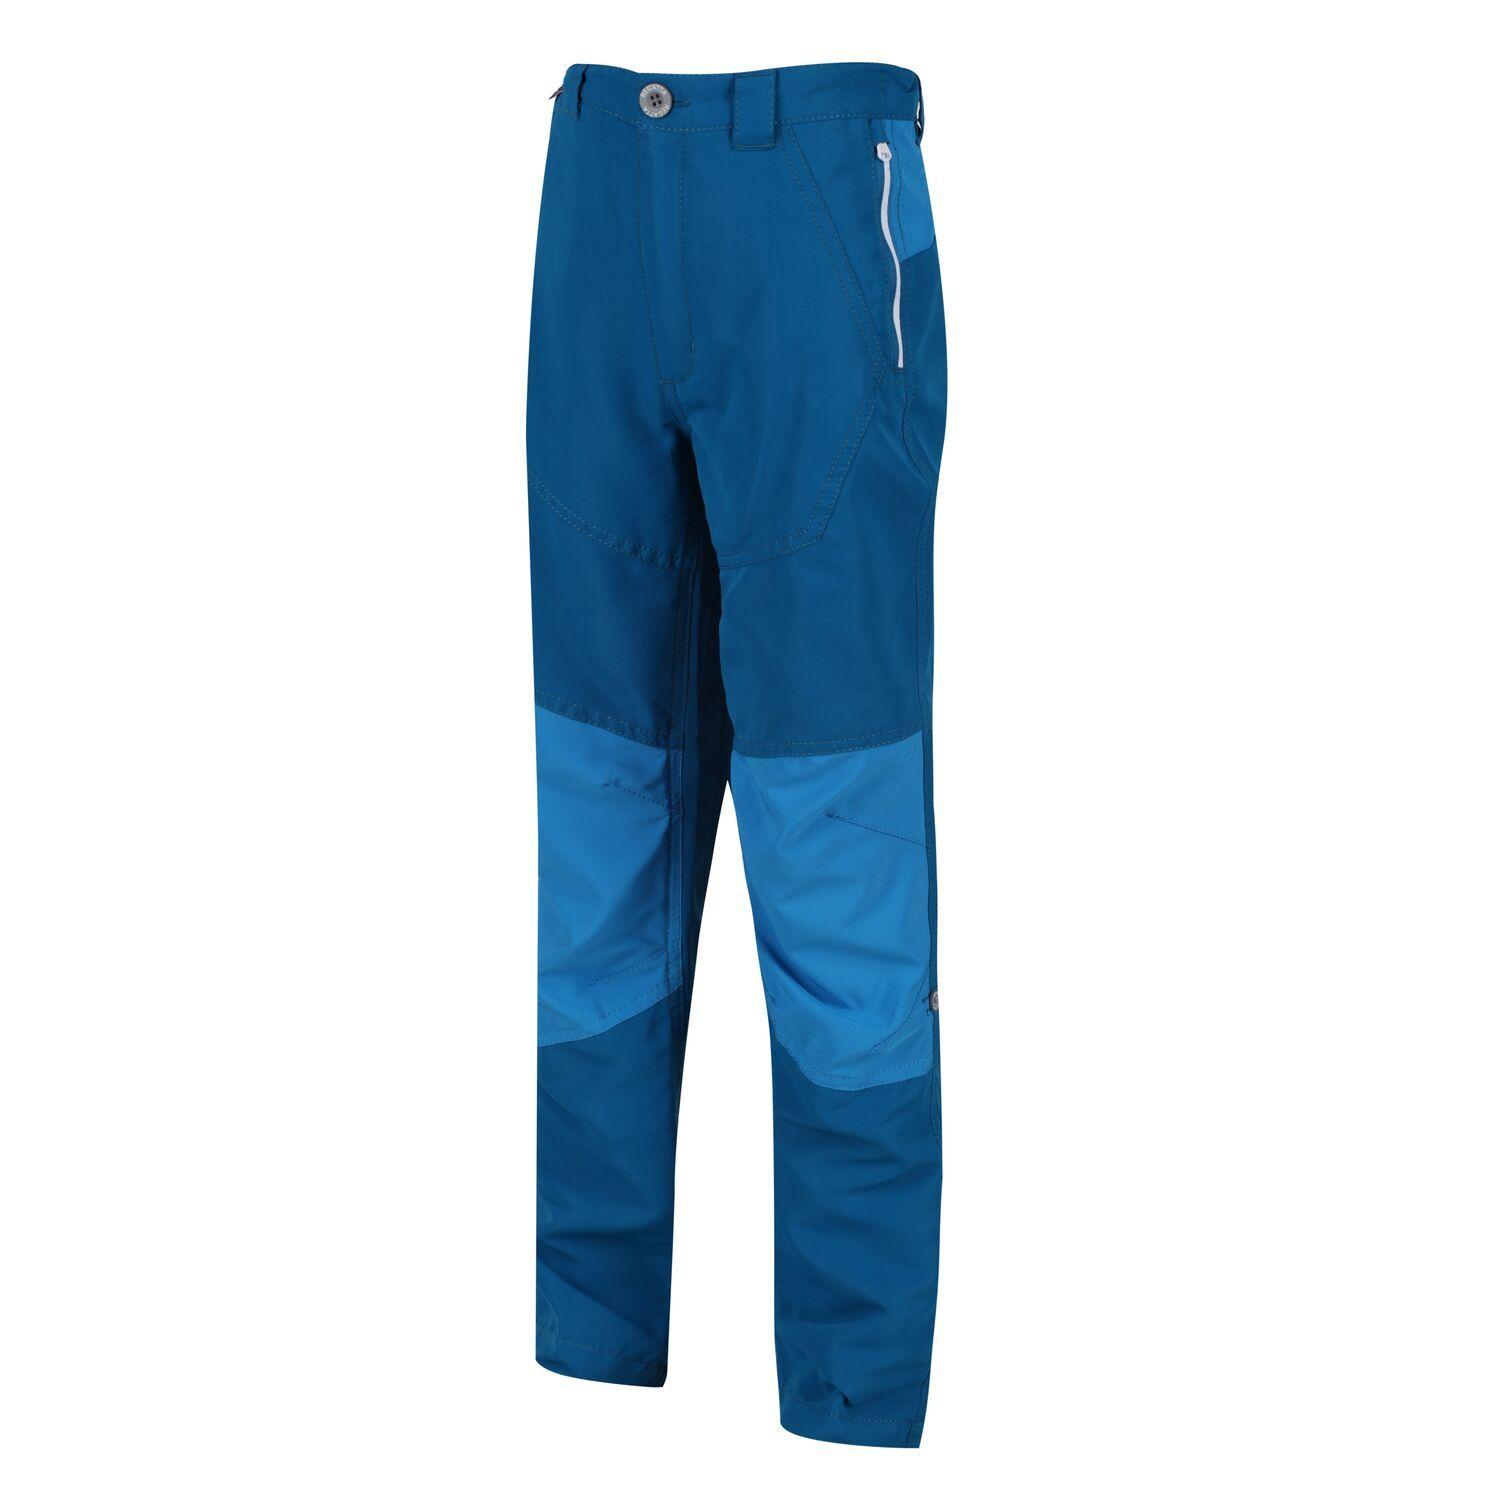 Regatta Childrens/Kids Sorcer IV Mountain Trousers